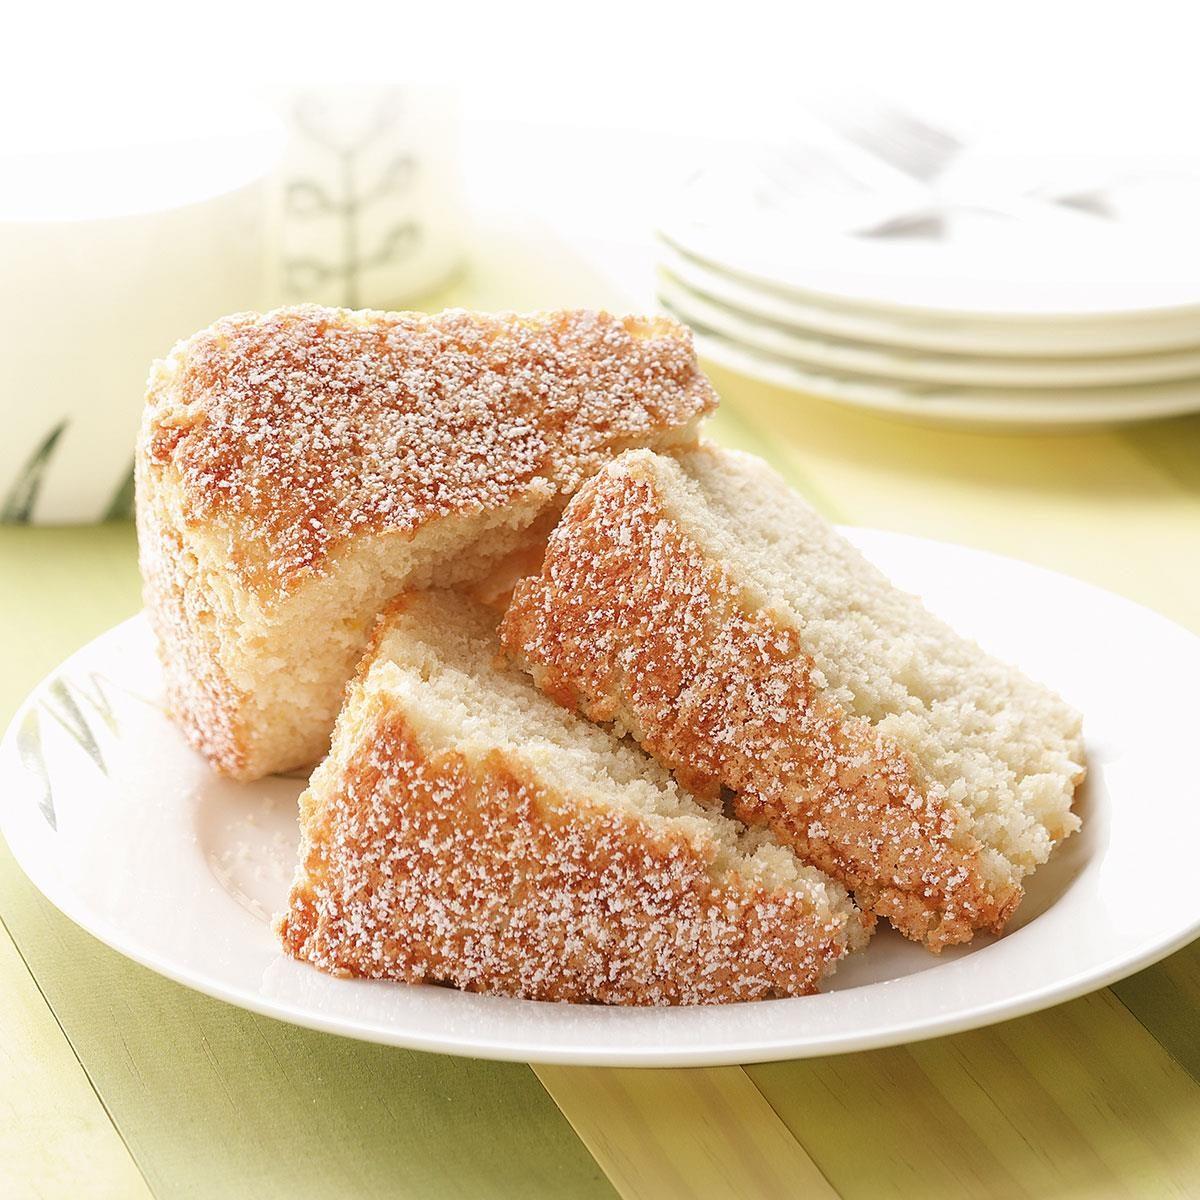 Make Coconut Macaroon Cake